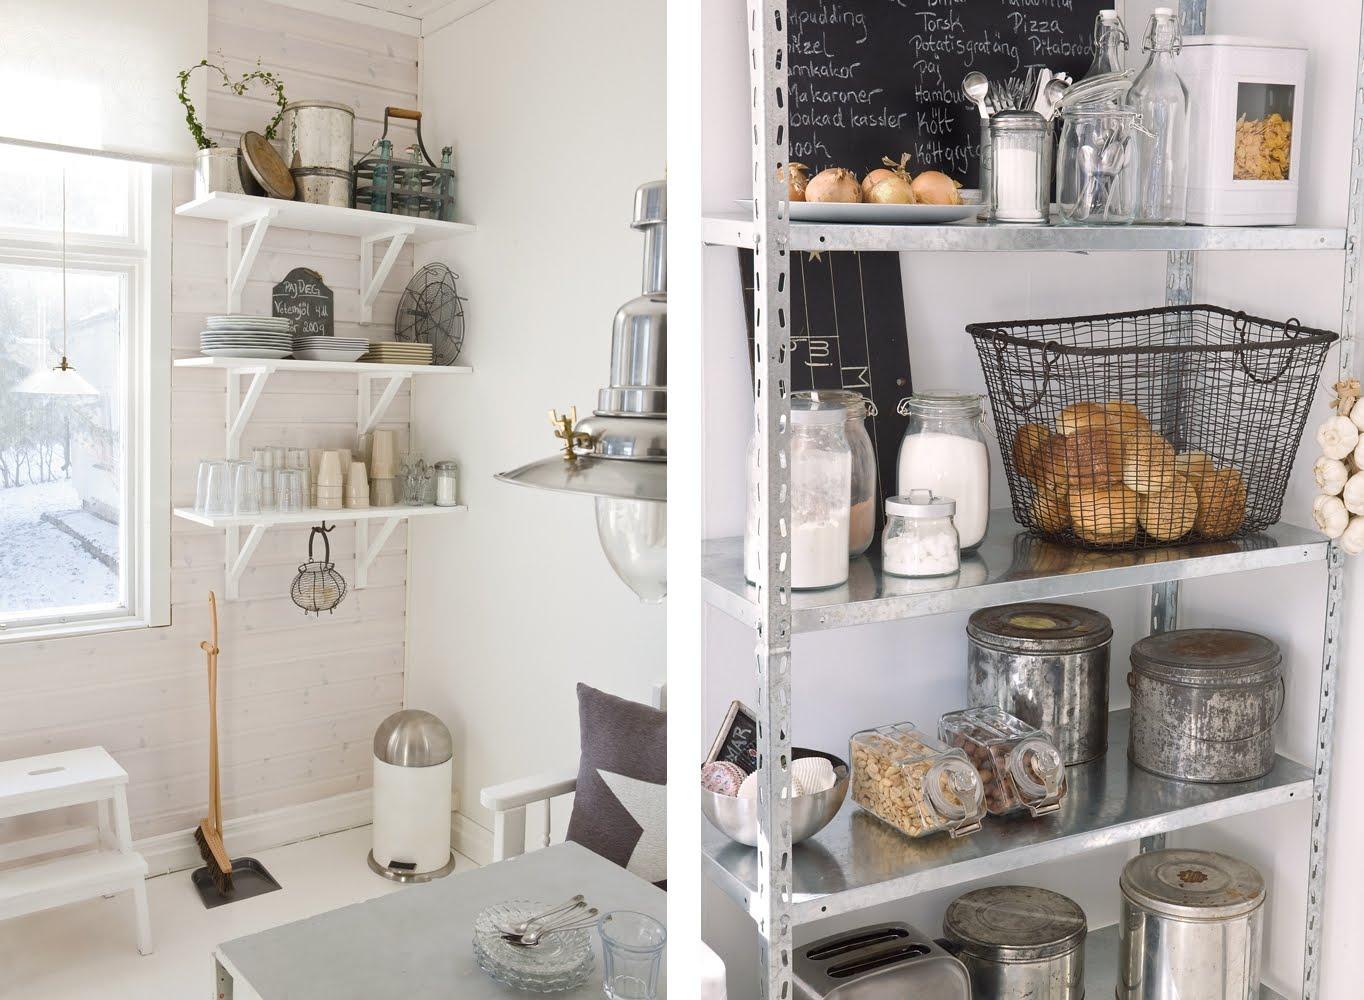 Slaapkamer Accessoires Landelijk : Lille Lykke: Modern landelijk in de keuken